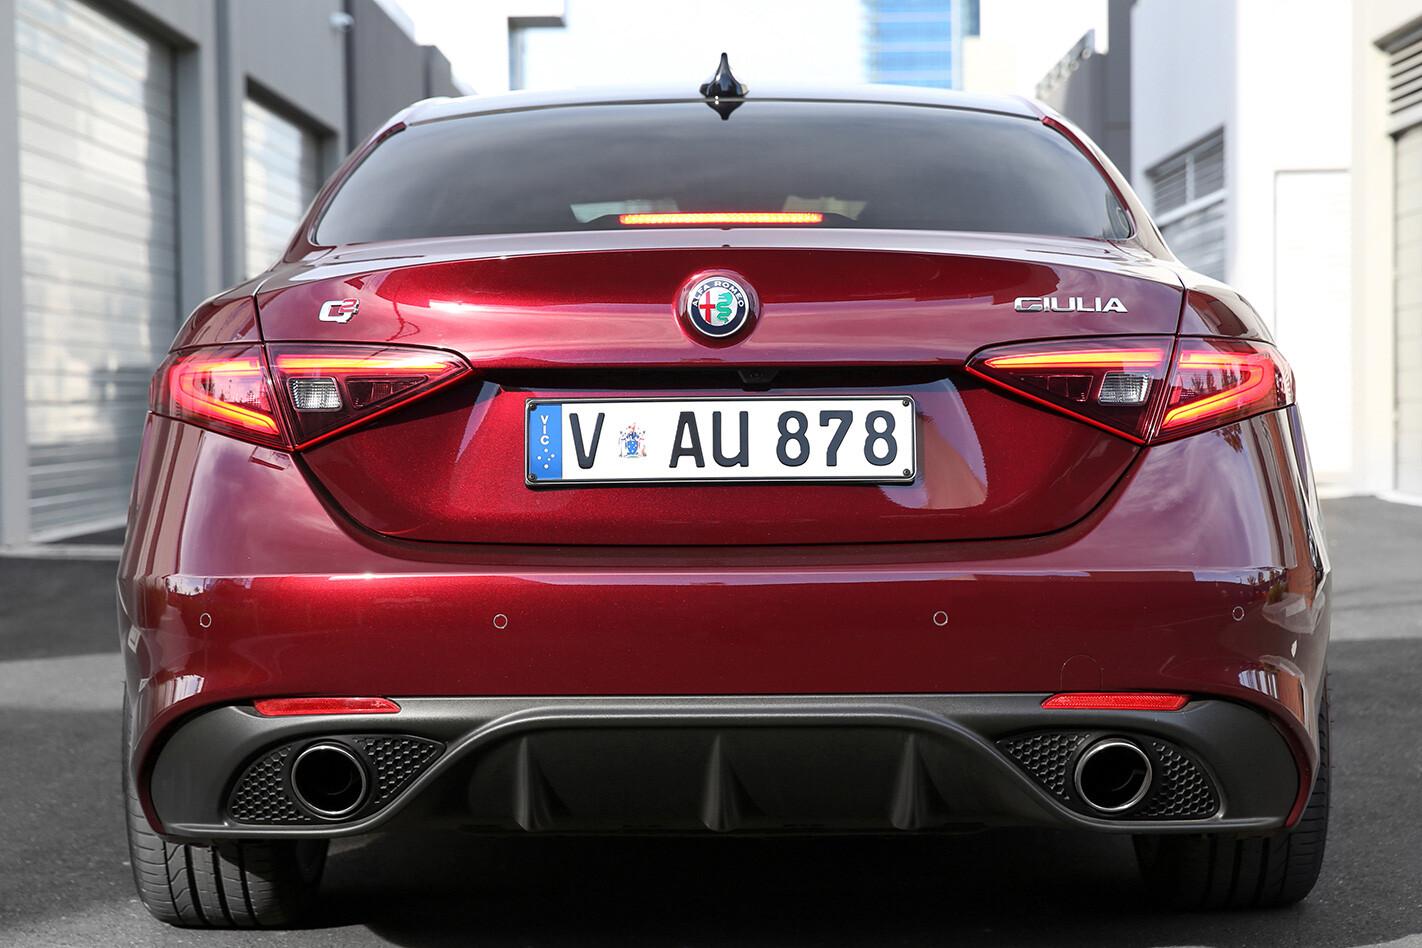 2017 Alfa Romeo Giulia Veloce rear